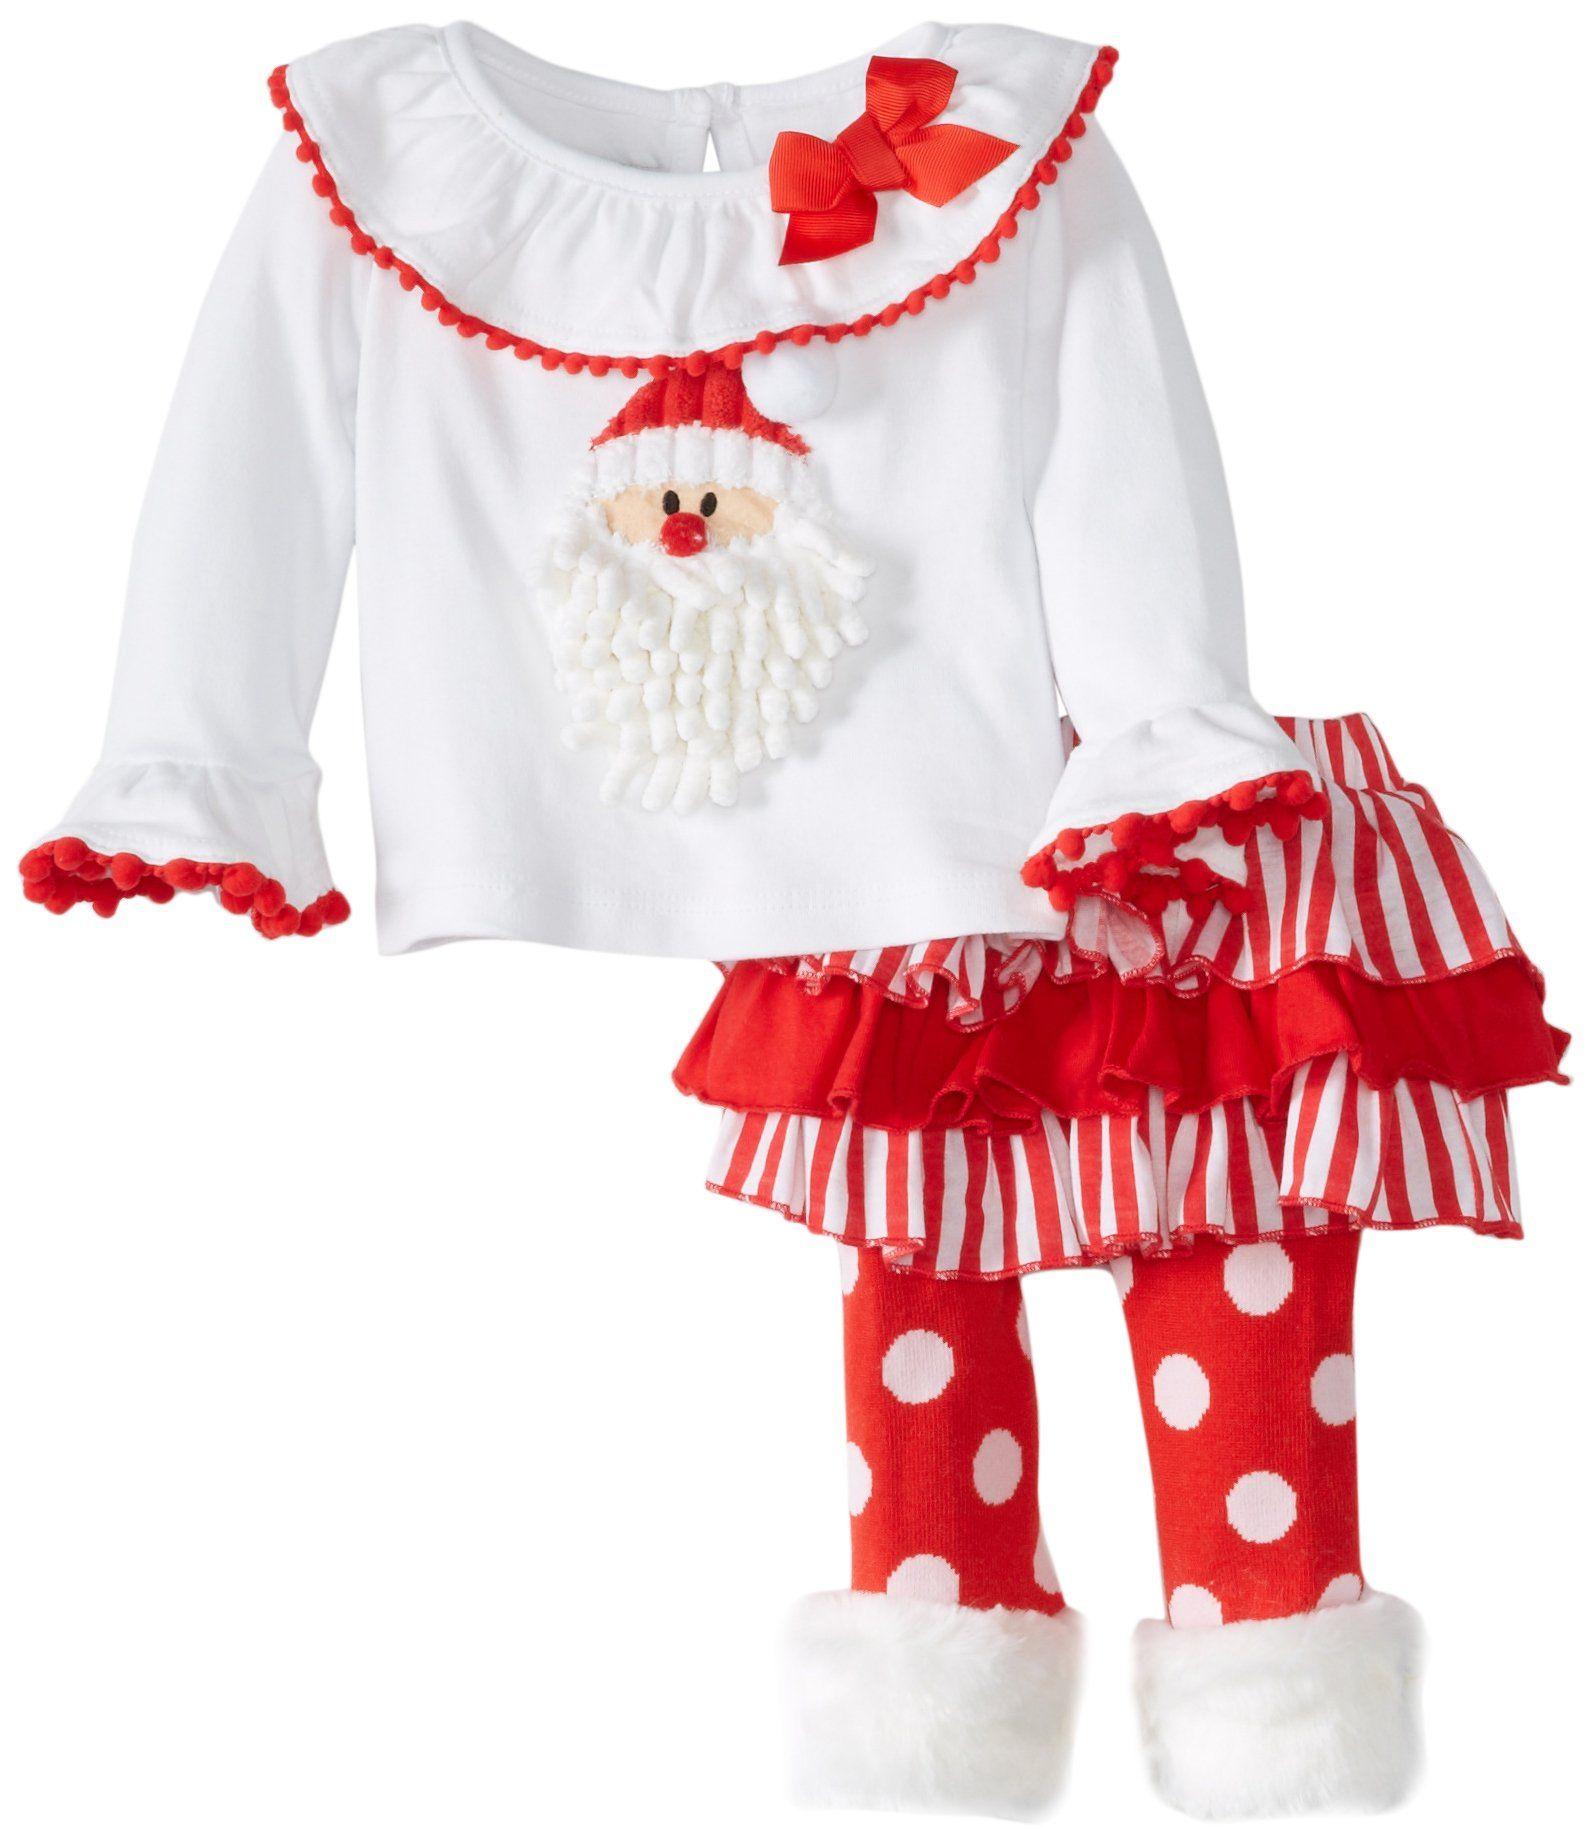 58a8763ba Amazon.com  Mud Pie Baby-Girls Newborn Santa Skirt Set with Fur Cuff ...